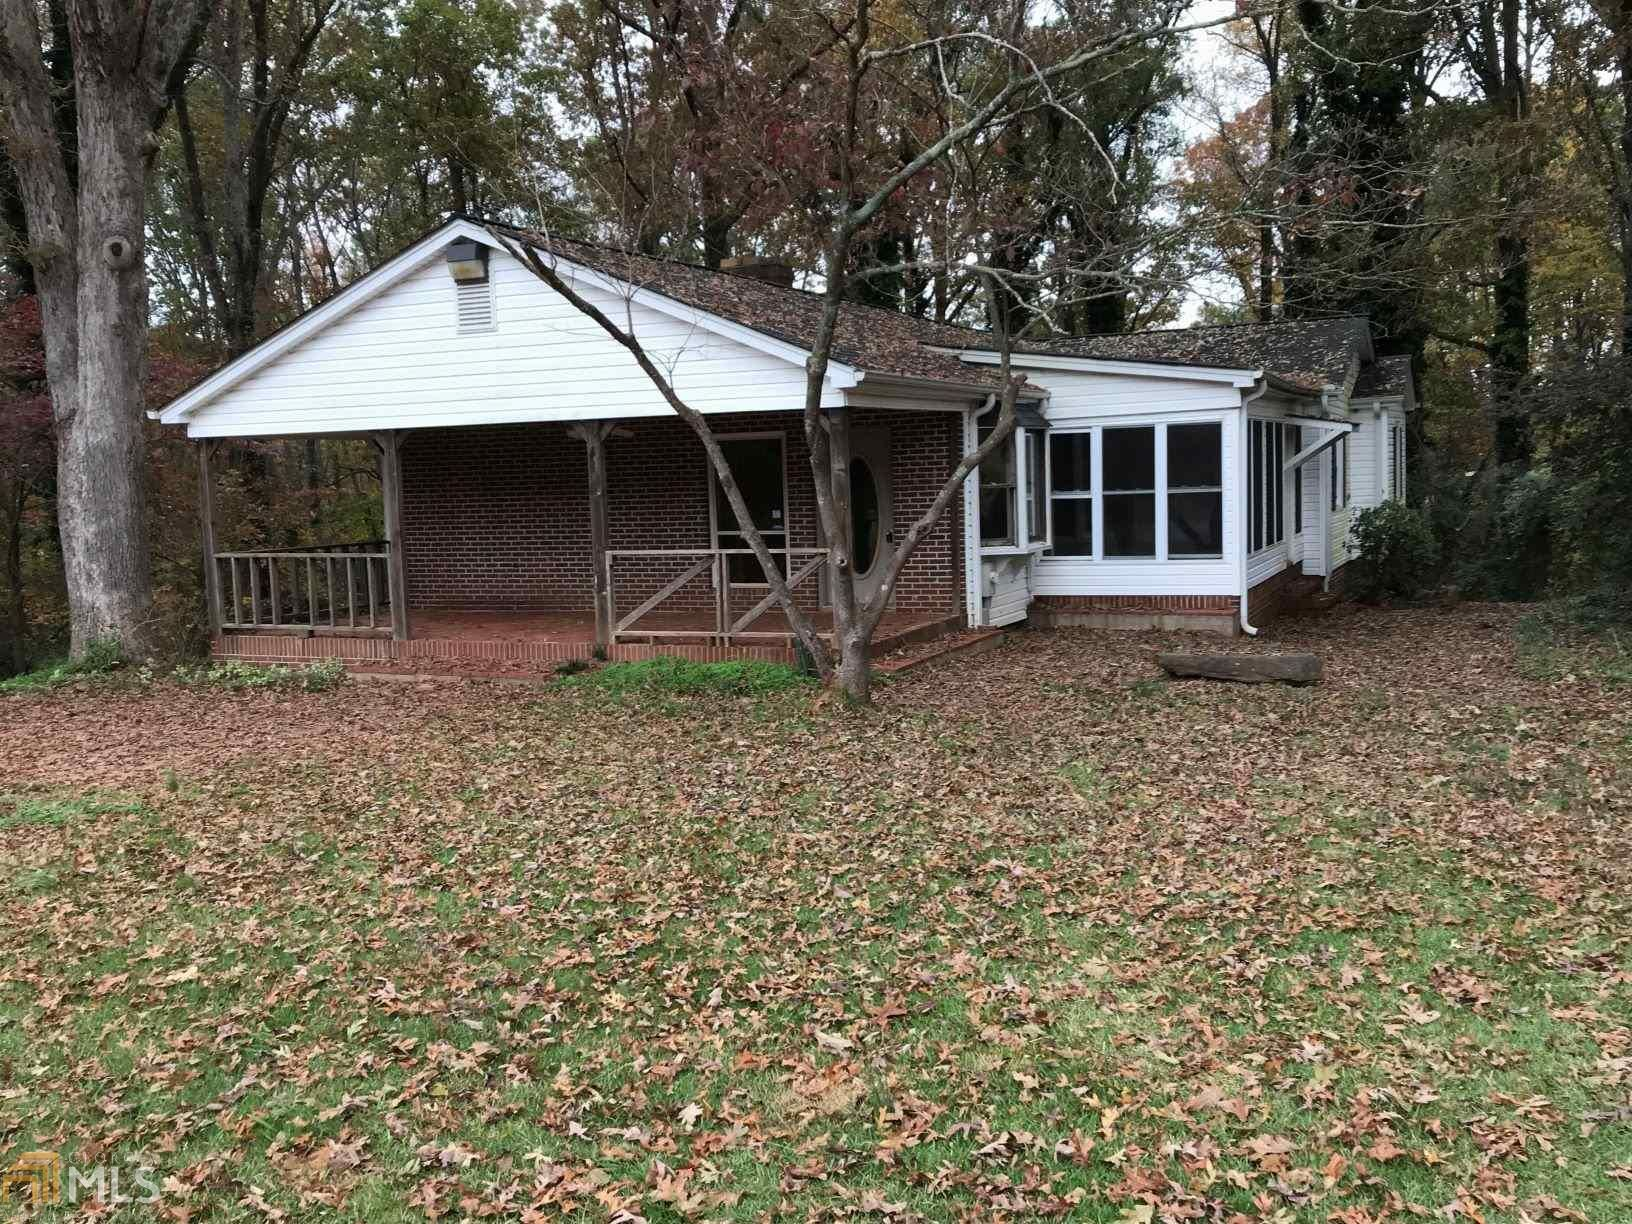 6919 Reed Creek Hwy, Hartwell, GA 30643 - MLS#: 8888143